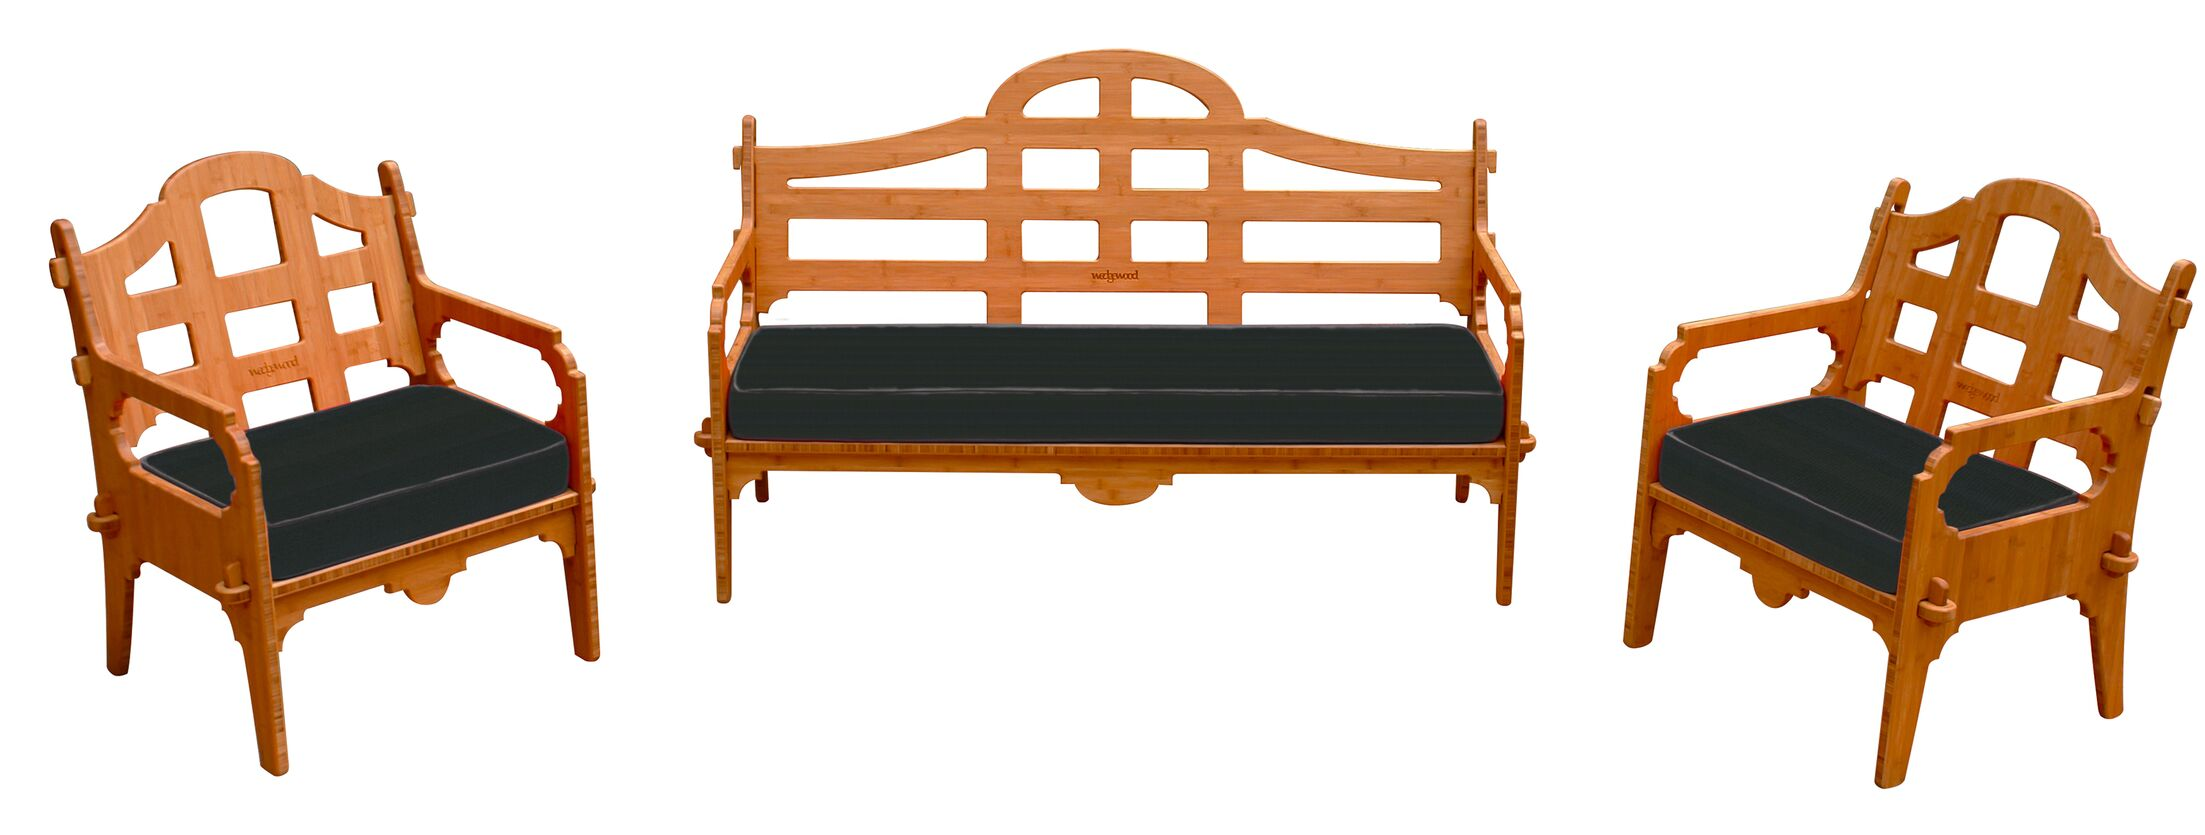 Burliegh 3 Piece Sunbrella Sofa Set with Cushions Fabric: Black